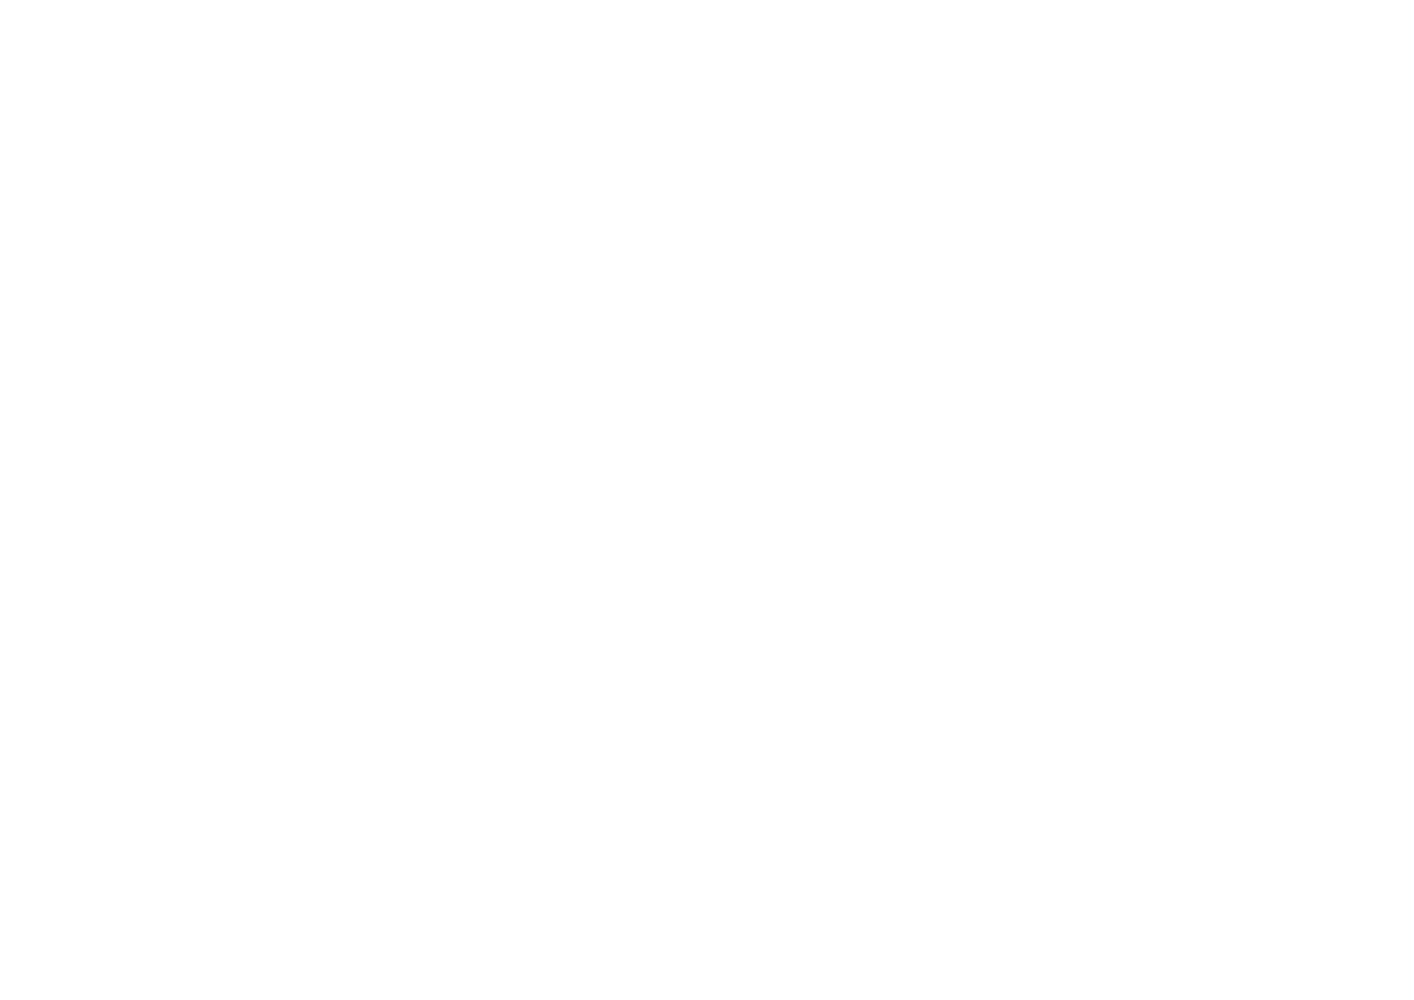 Zamericanenglish Q&A